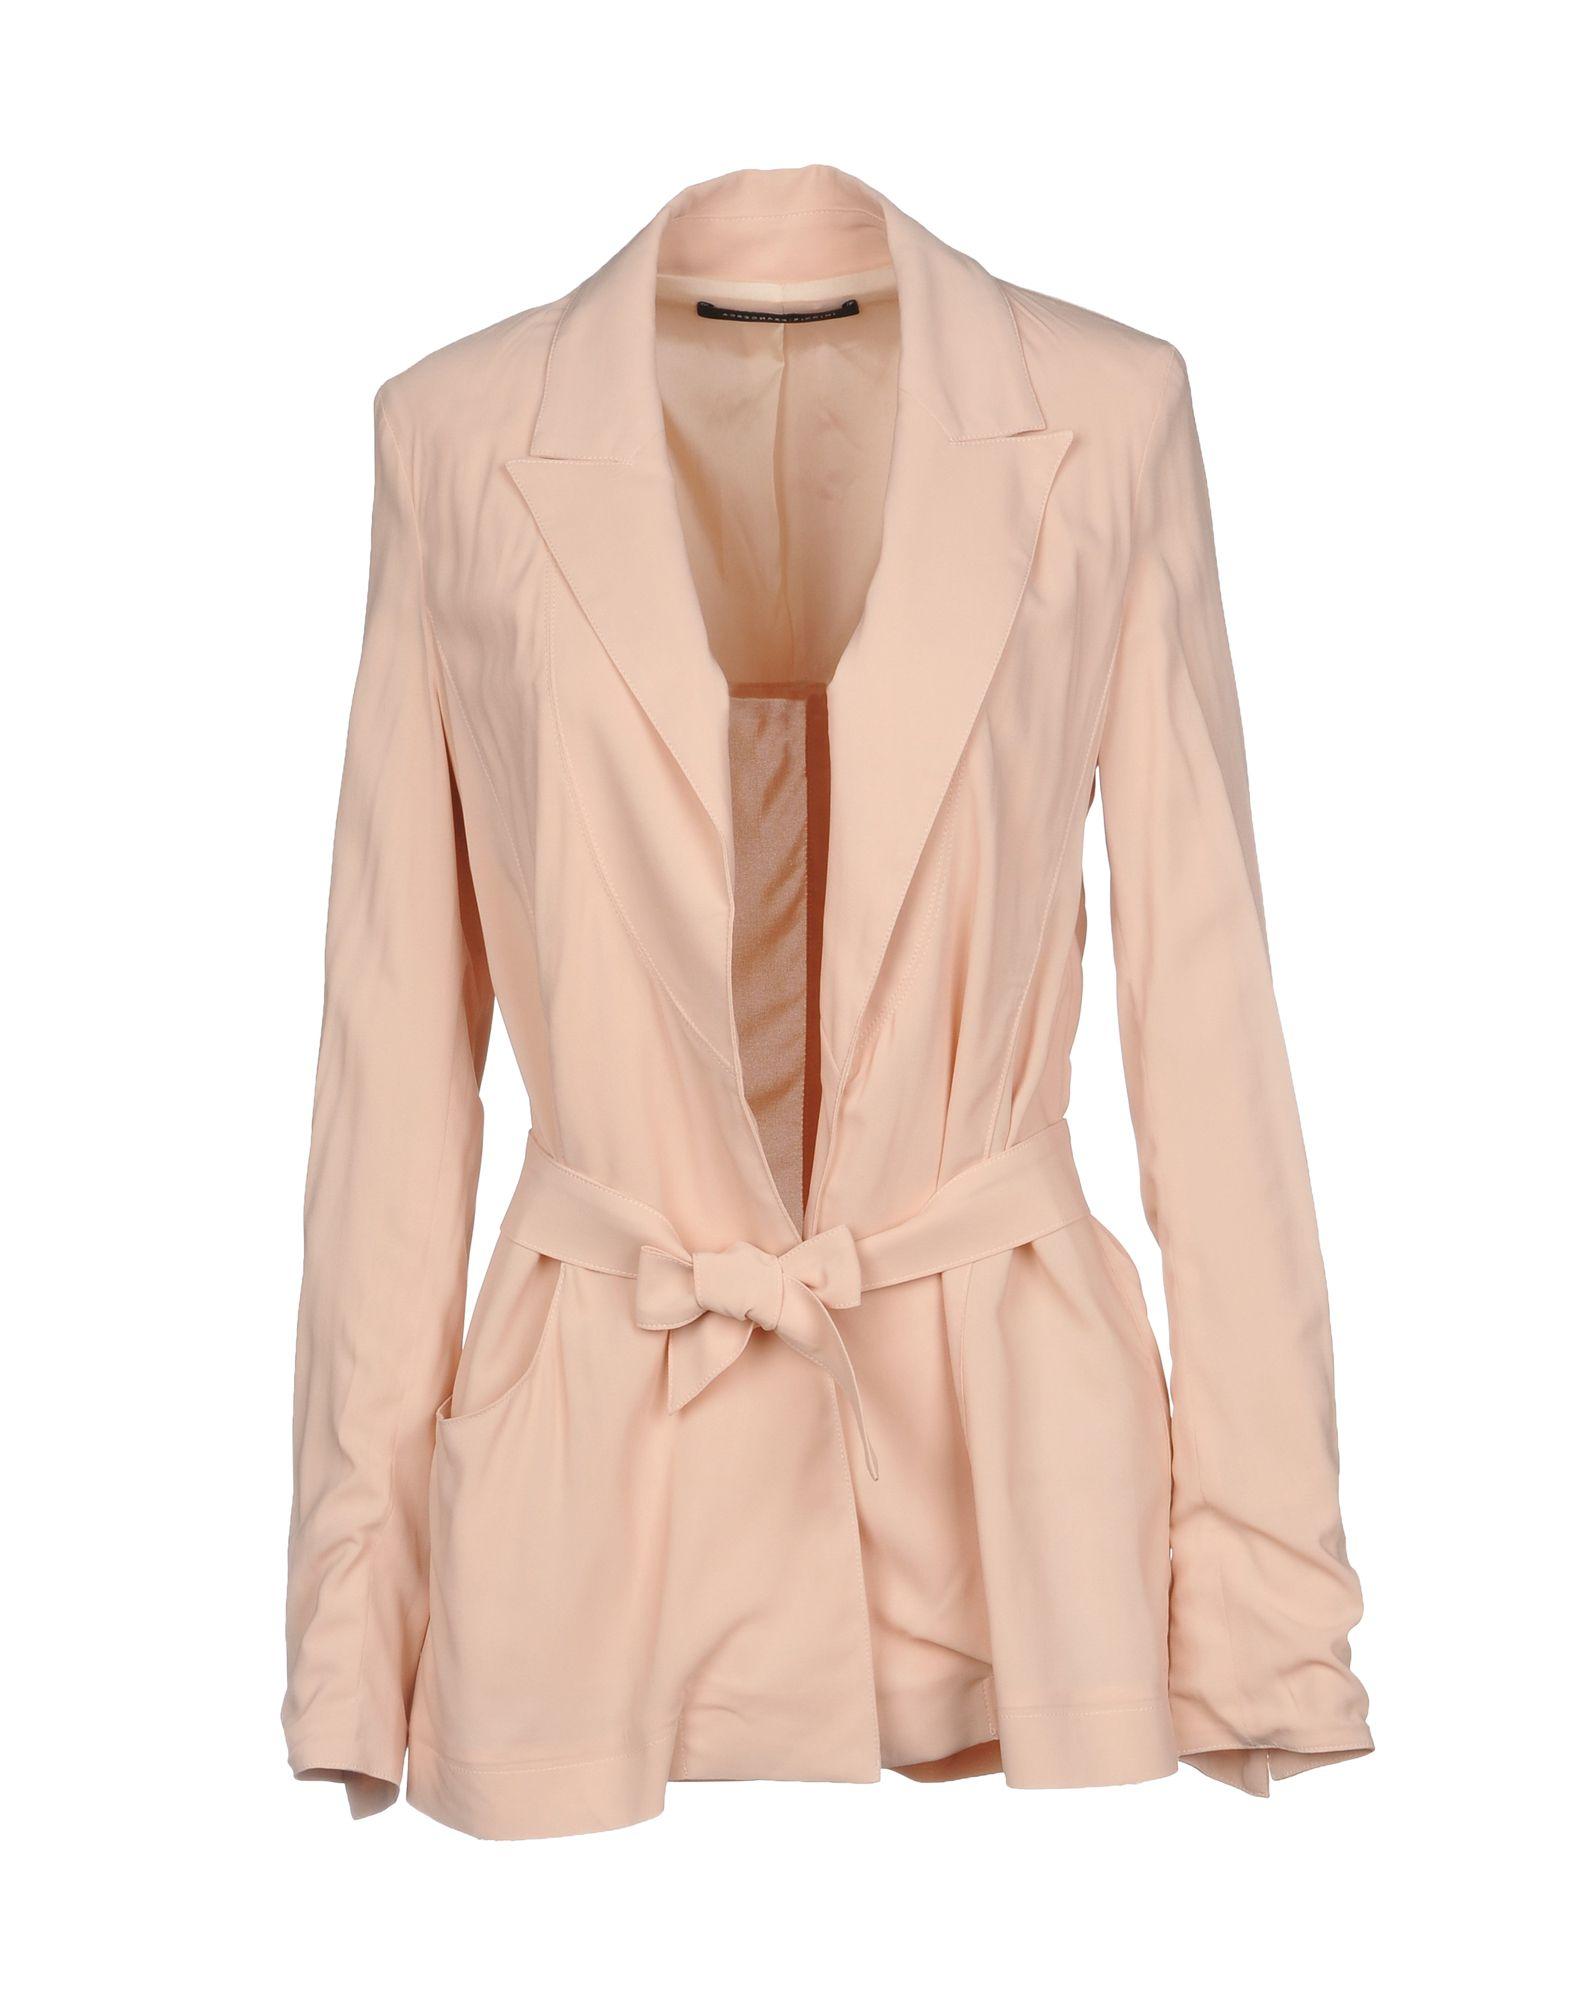 FRANCESCA PICCINI Blazer in Pink